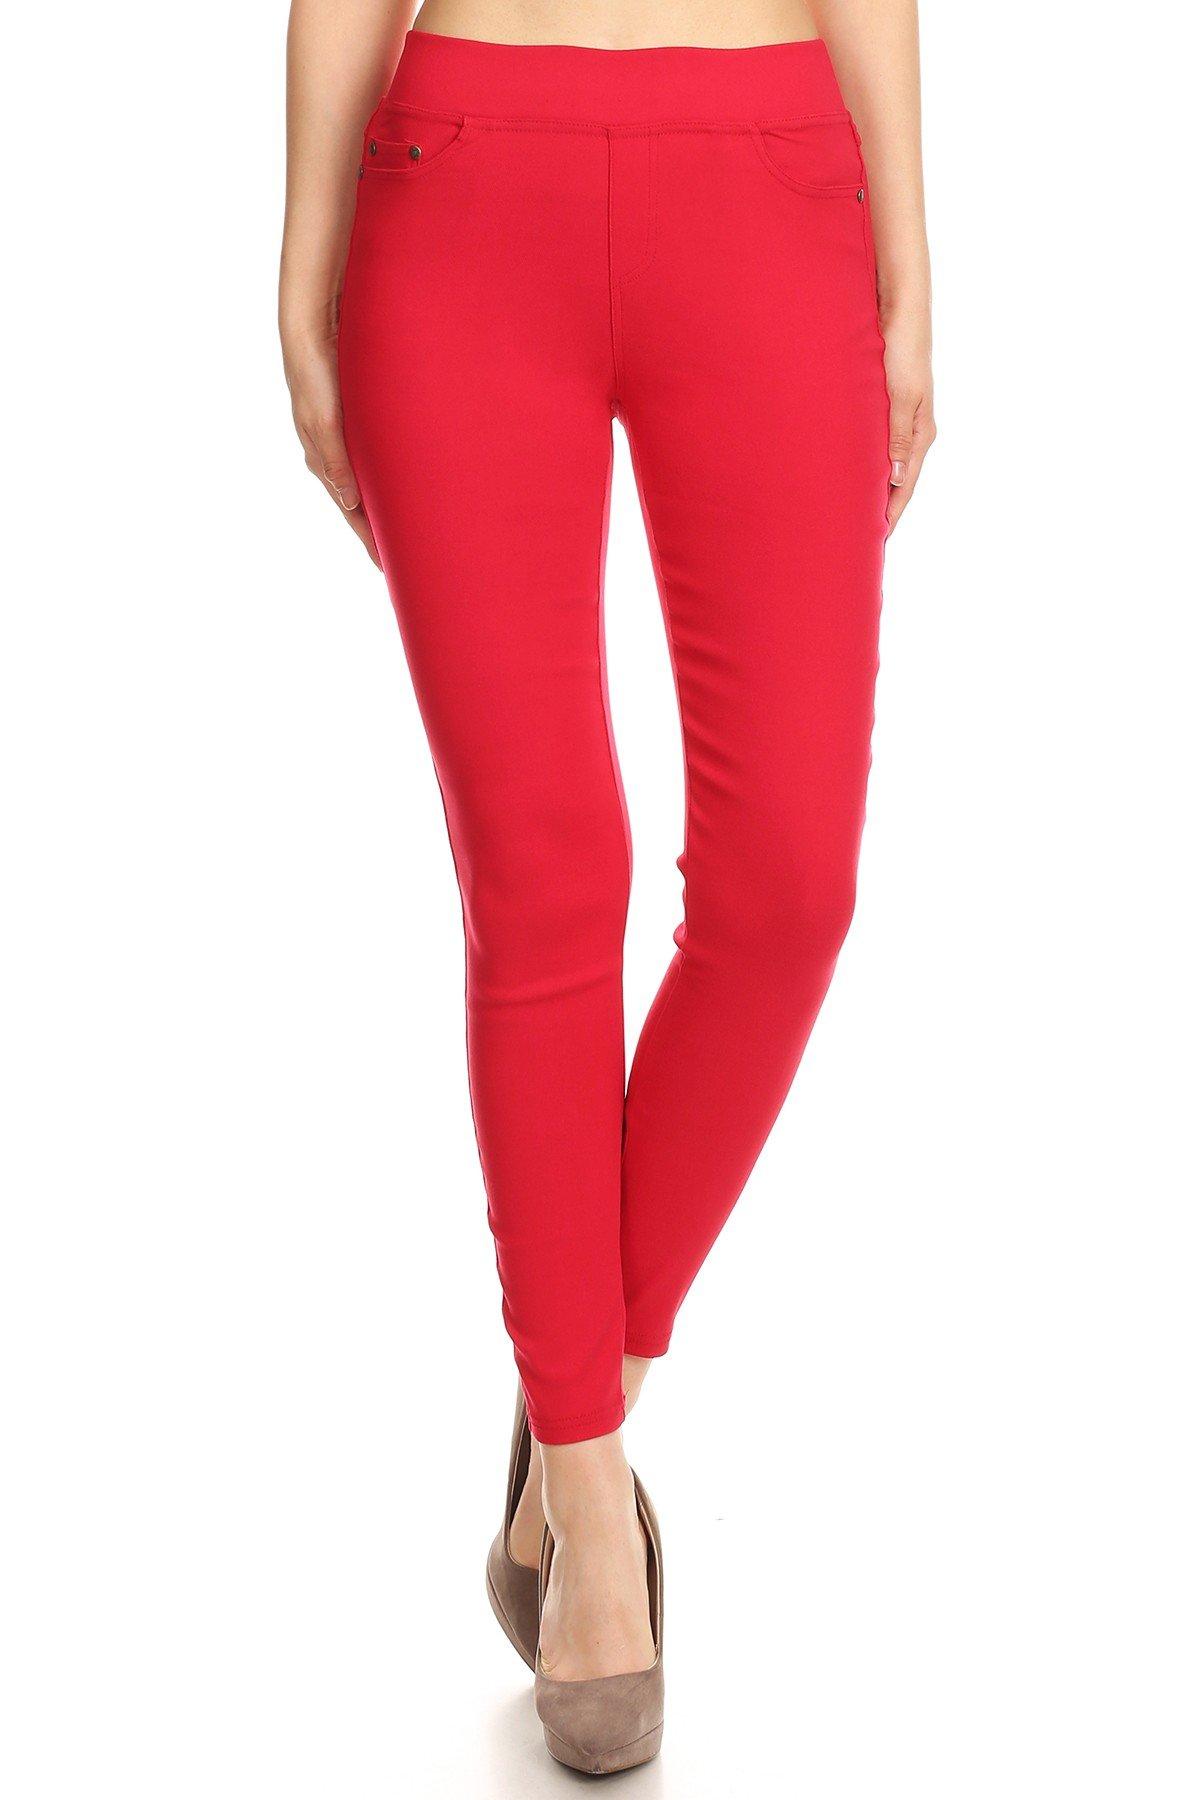 MissMissy Women's Casual Color Denim Slim Fit Skinny Elastic Waist Band Spandex Jeggings Ankle Jeans Pants (Small, Red)